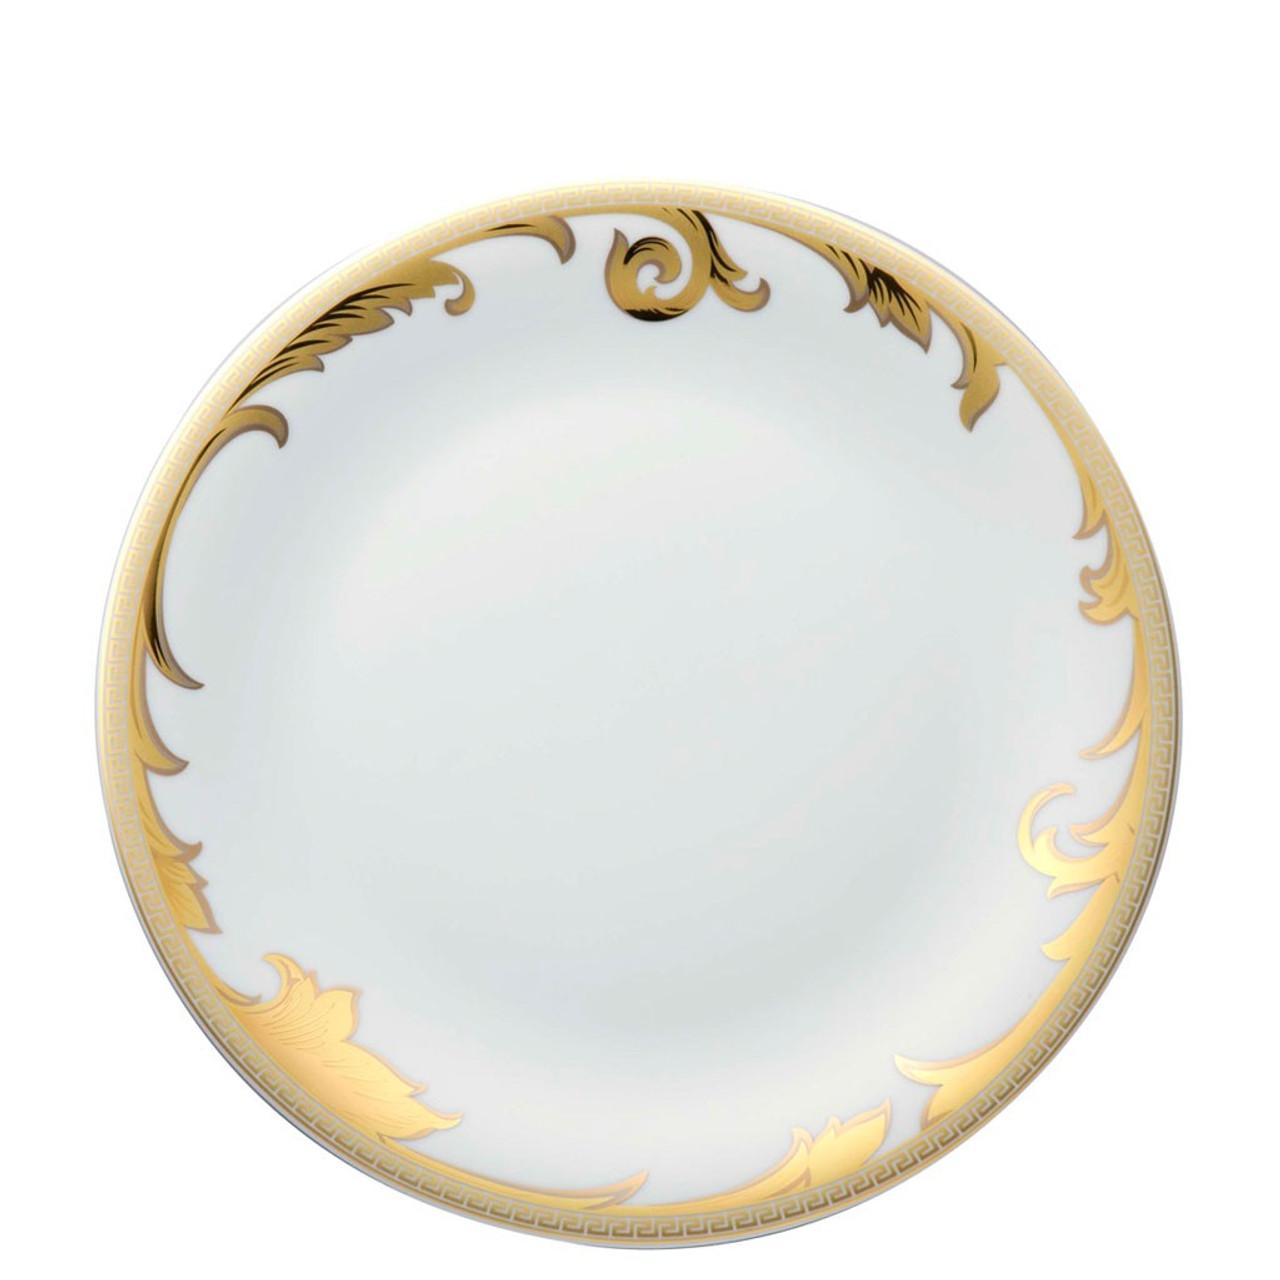 Dinner Plate, 11 1/2 inch | Arabesque Gold| Rosenthal Shop